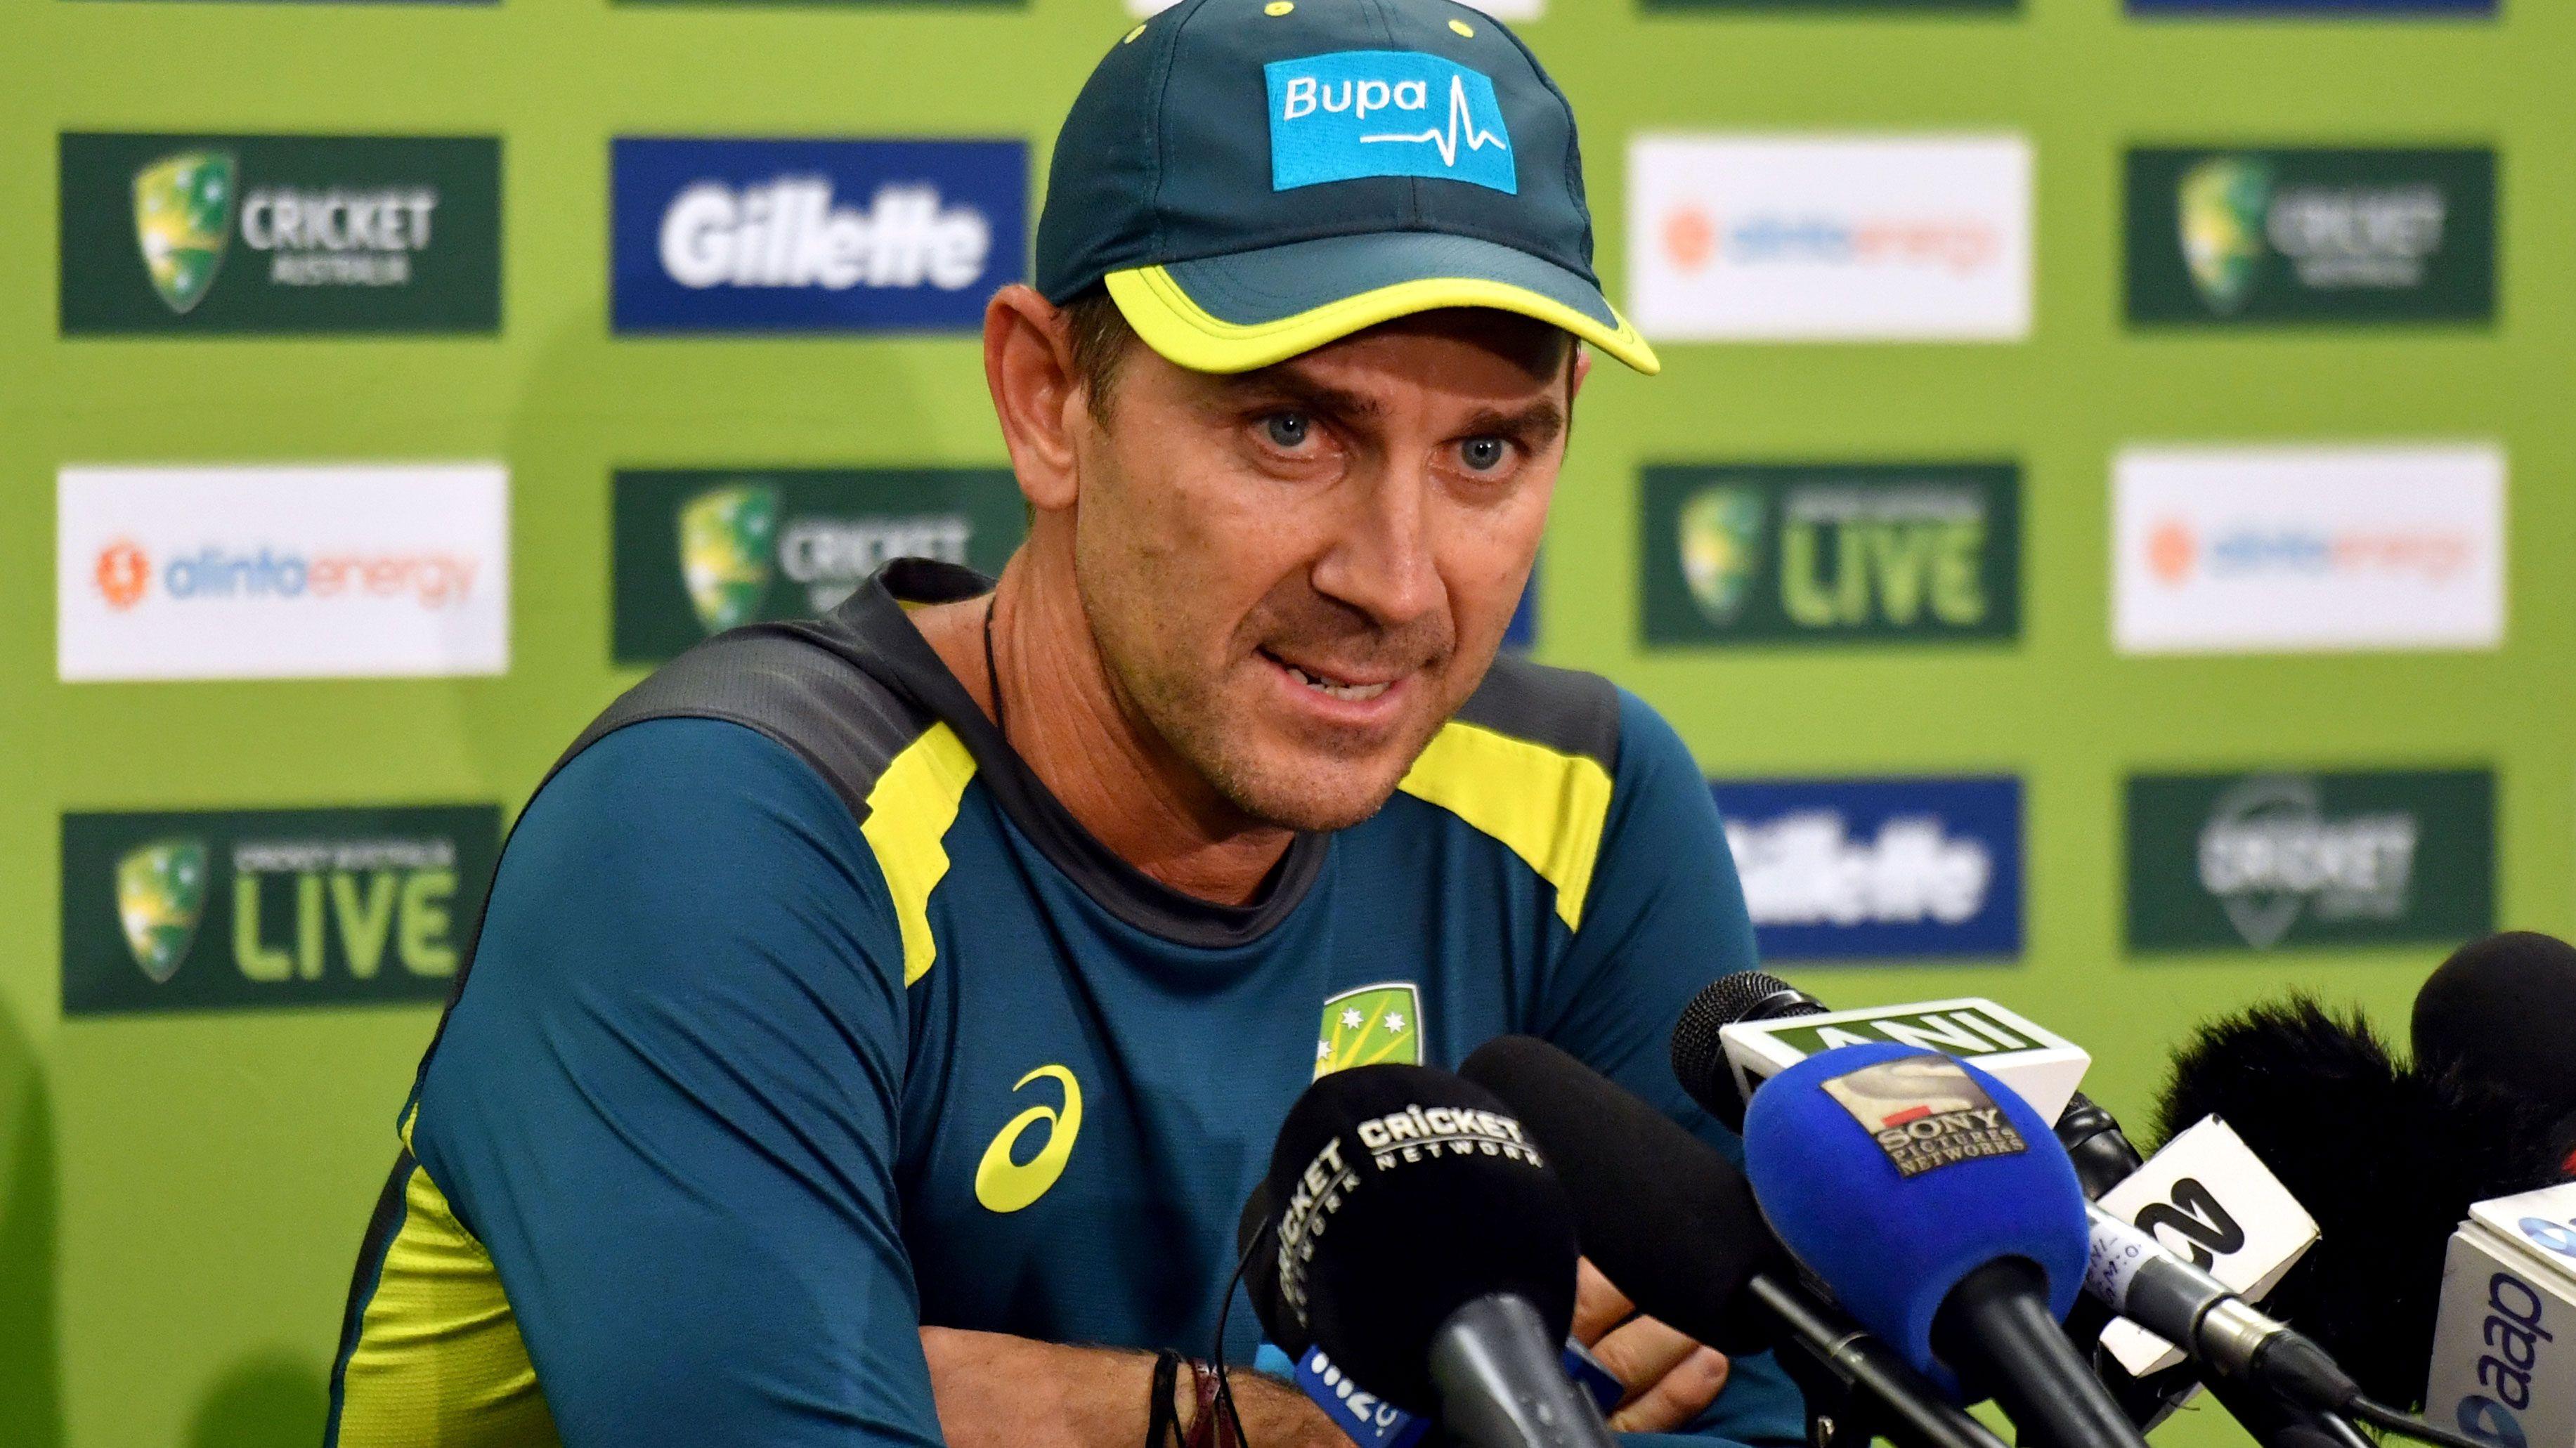 Justin Langer speaks about rebuilding the damage done to Australian cricket